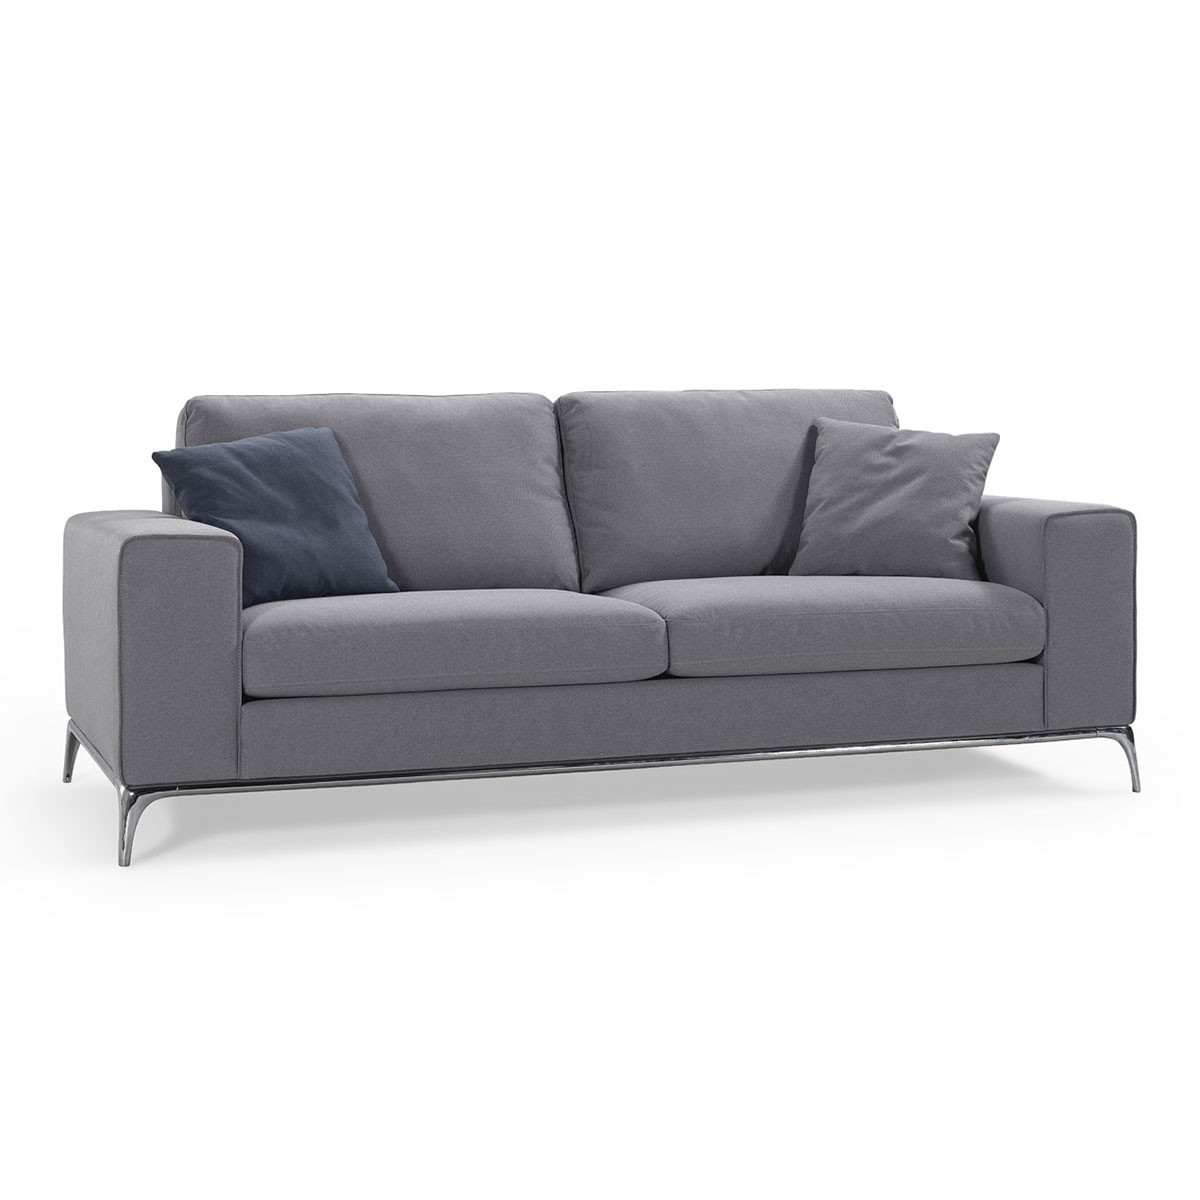 walmart ip black loveseat com sleeper mainstays couch